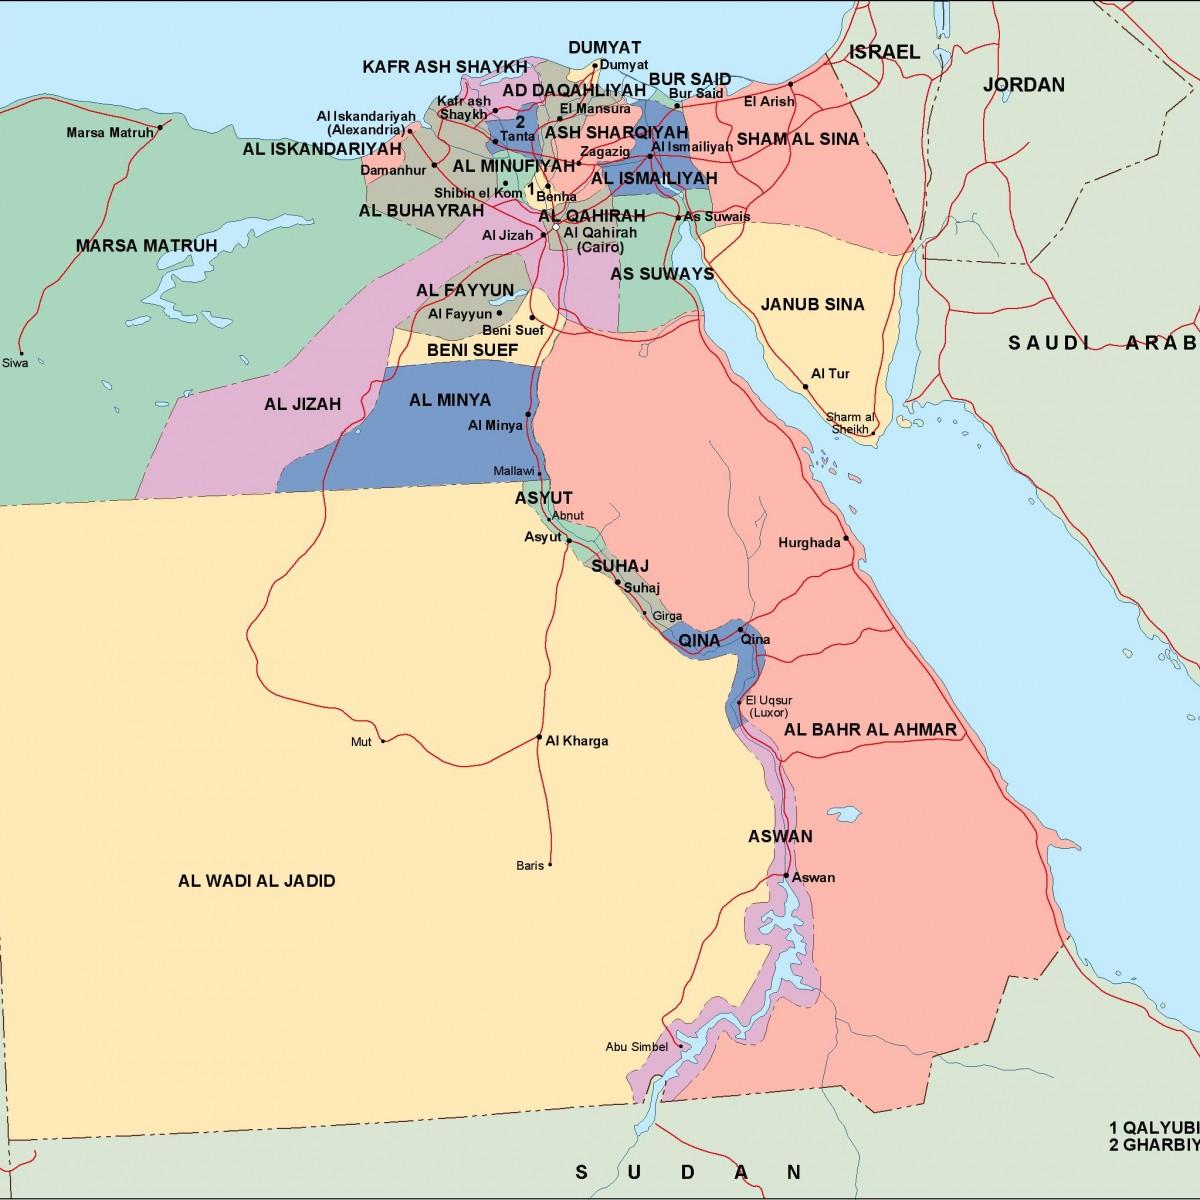 egypt political map. Vector Eps maps. Eps Illustrator Map | A vector ...